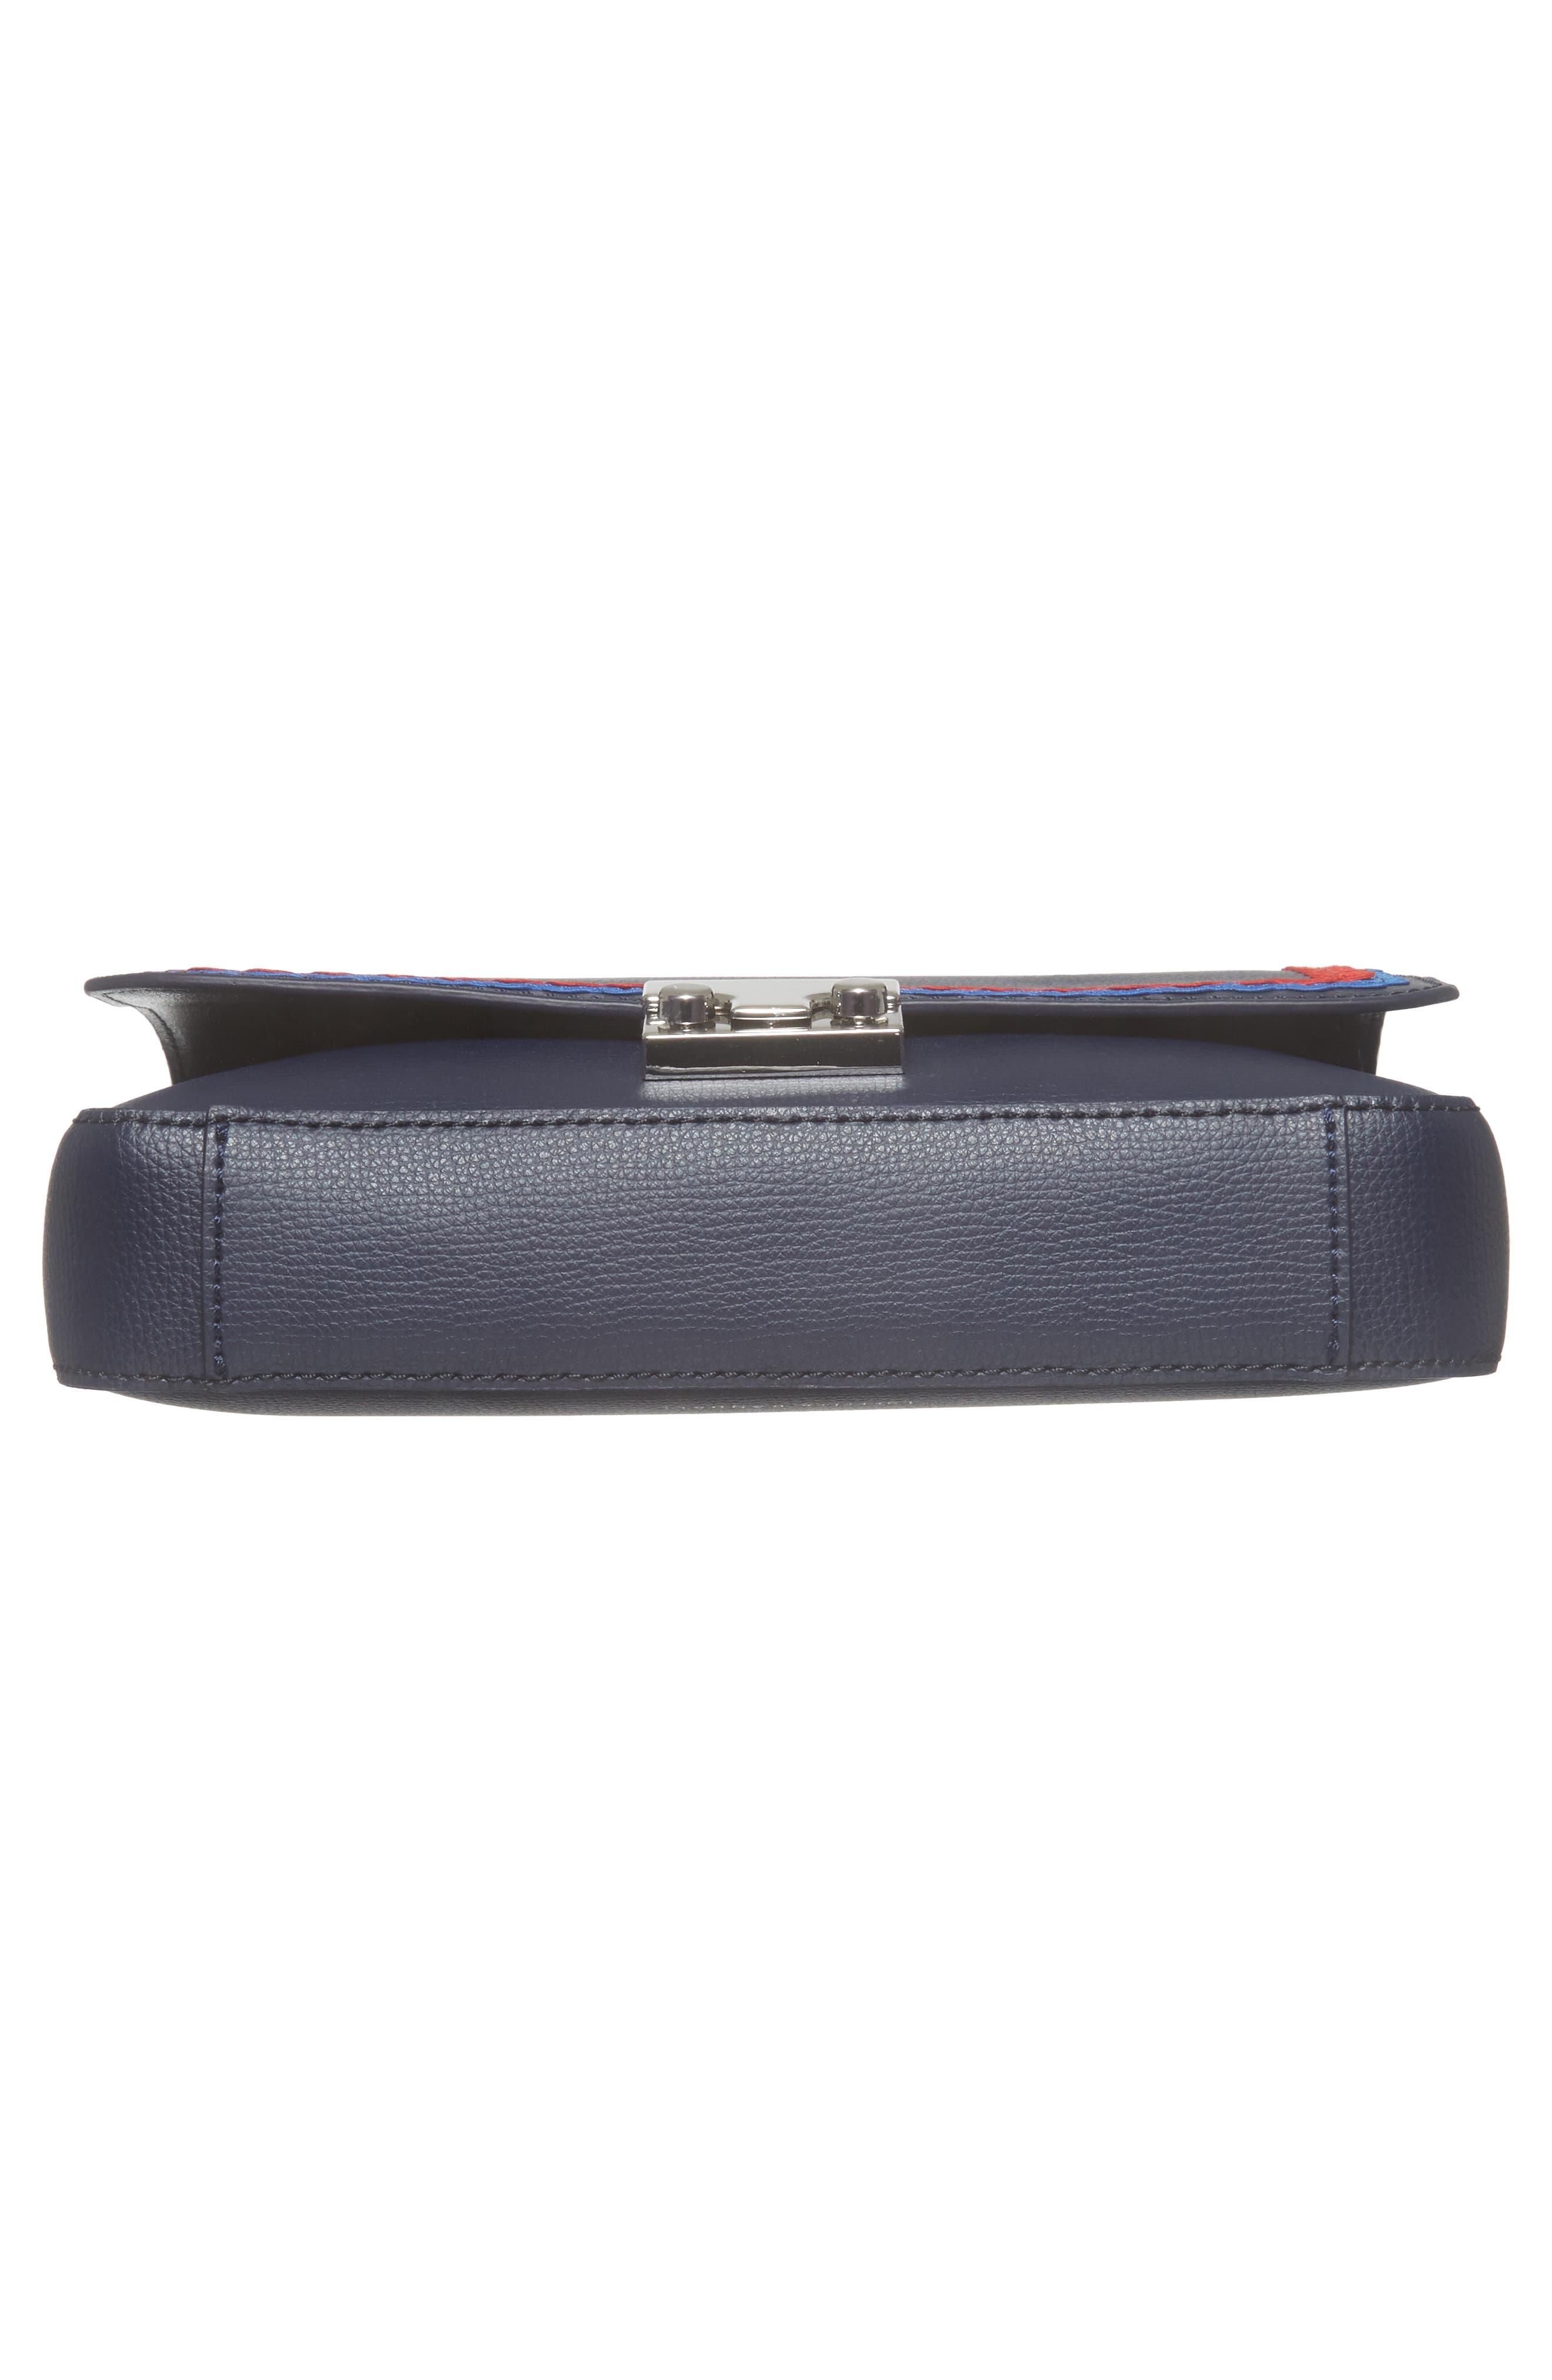 Lock Leather Flap Clutch/Shoulder Bag,                             Alternate thumbnail 6, color,